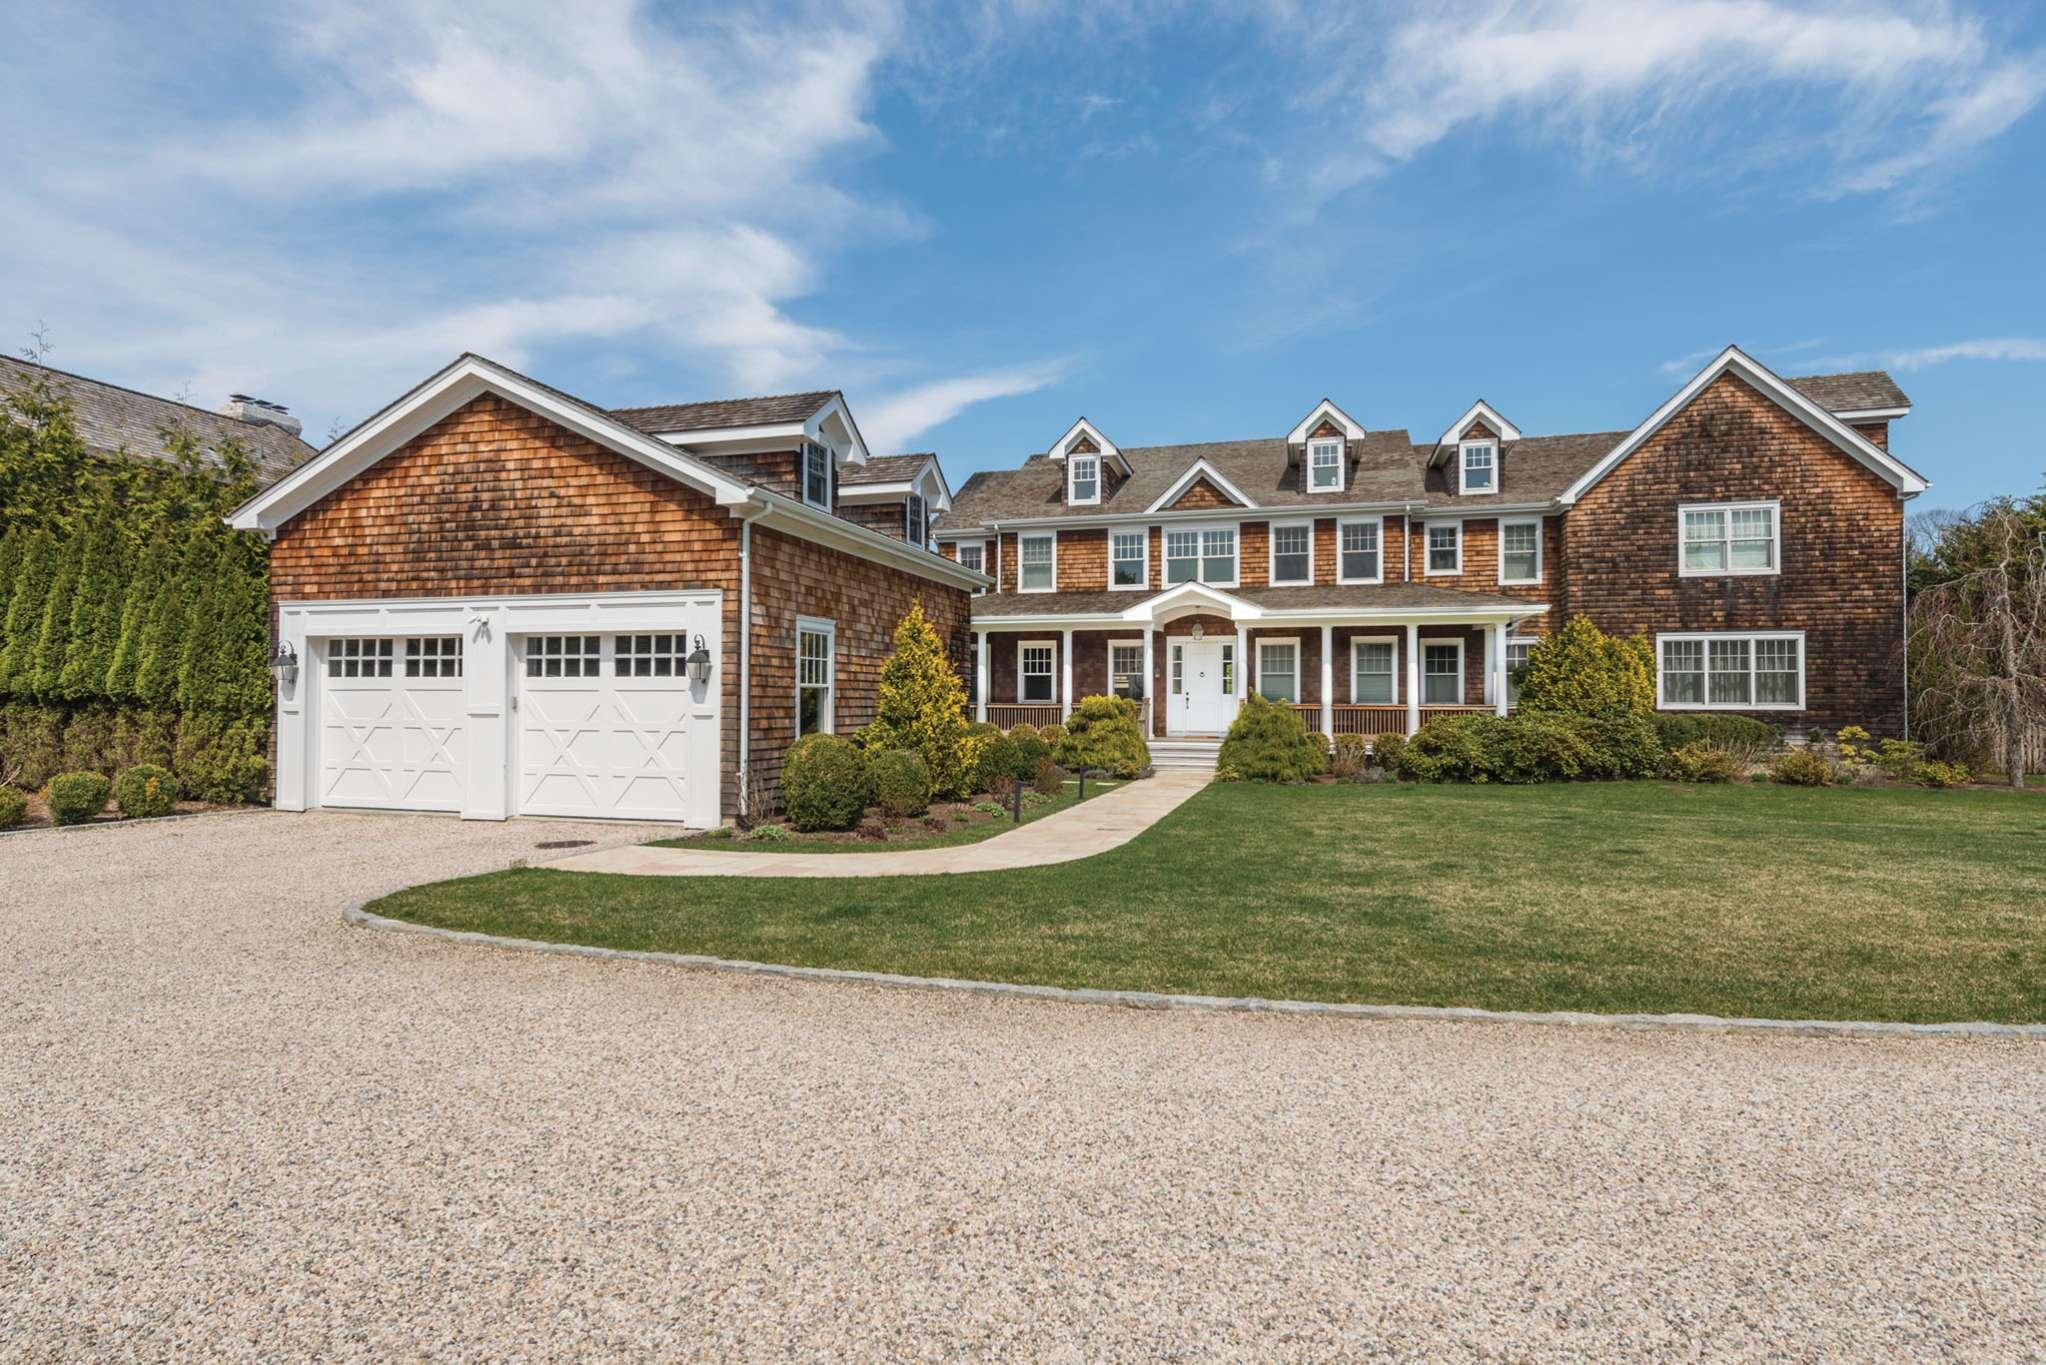 Casa Unifamiliar por un Alquiler en Bridgehampton Luxury Rental 365 Lumber Lane, Bridgehampton, Nueva York